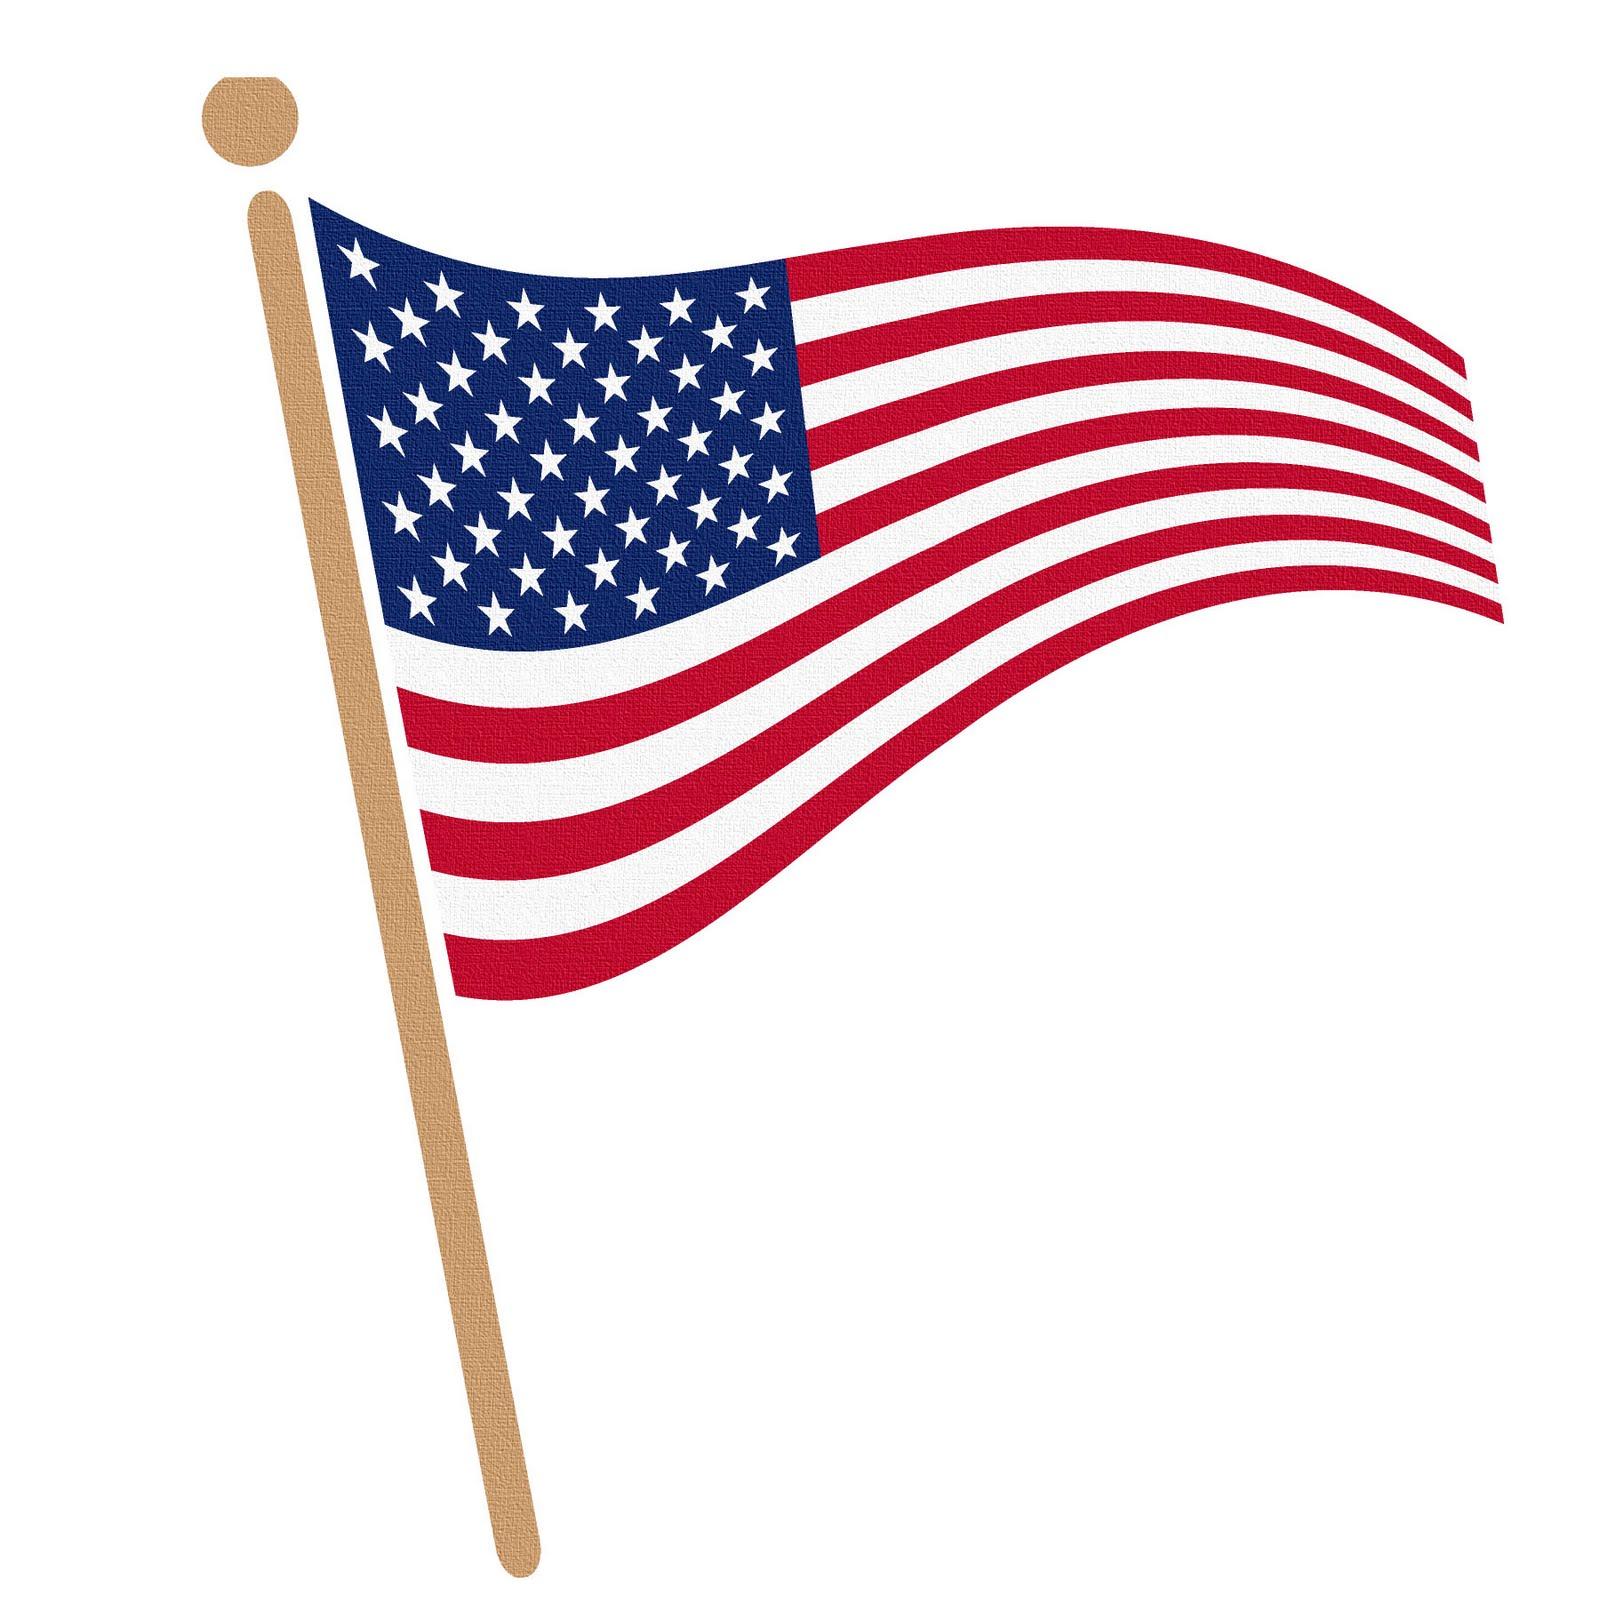 1600x1600 America Clipart Us Flag